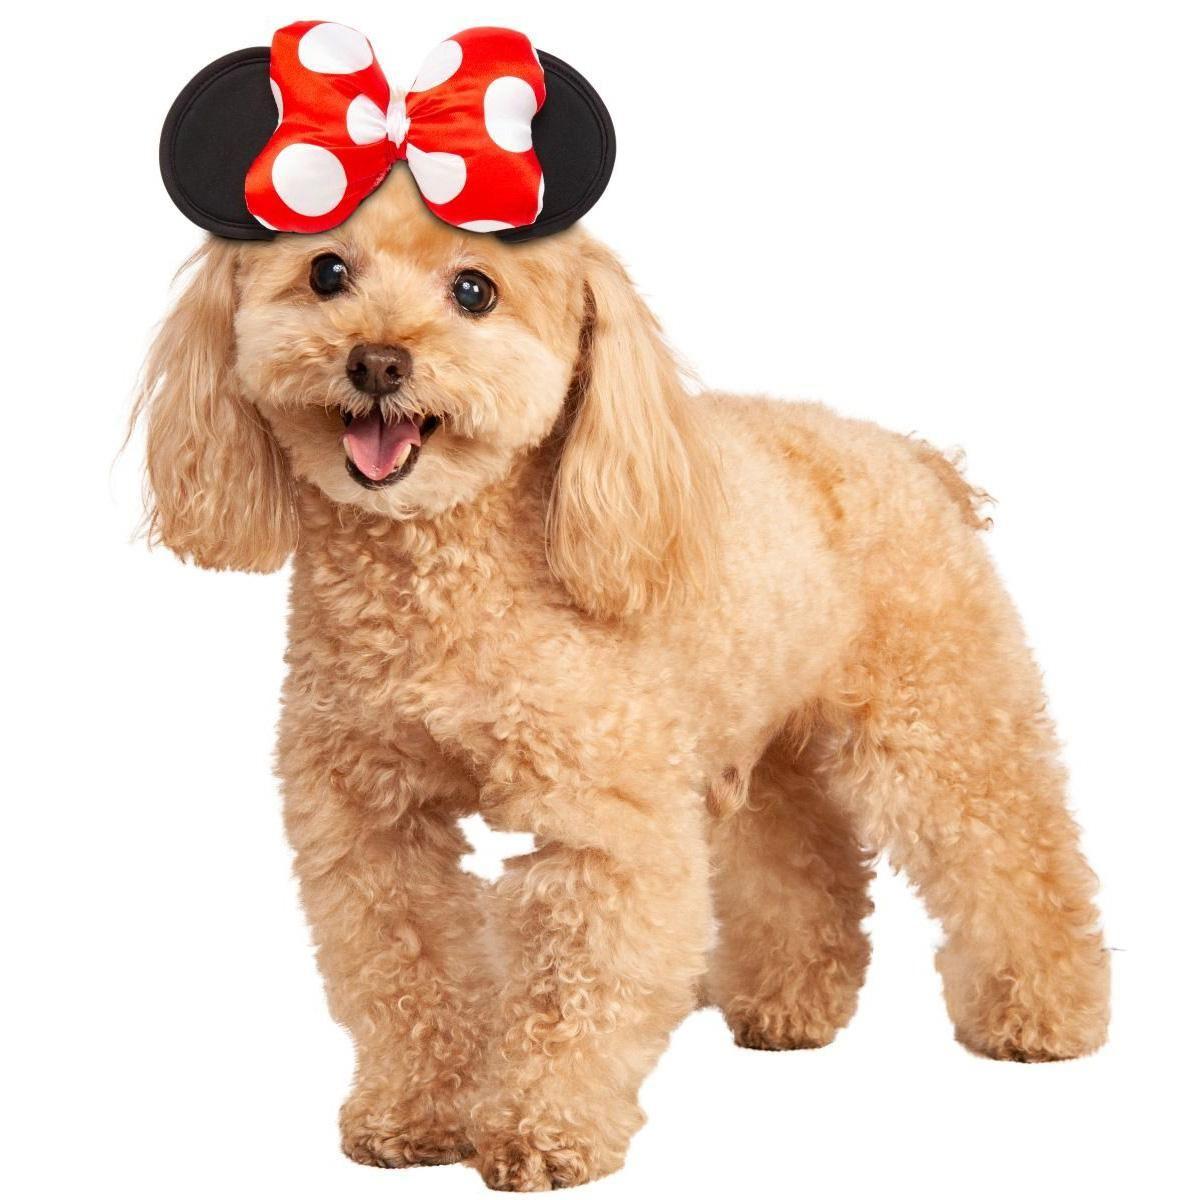 Disney Minnie Mouse Headpiece Dog Costume By Rubies Pet